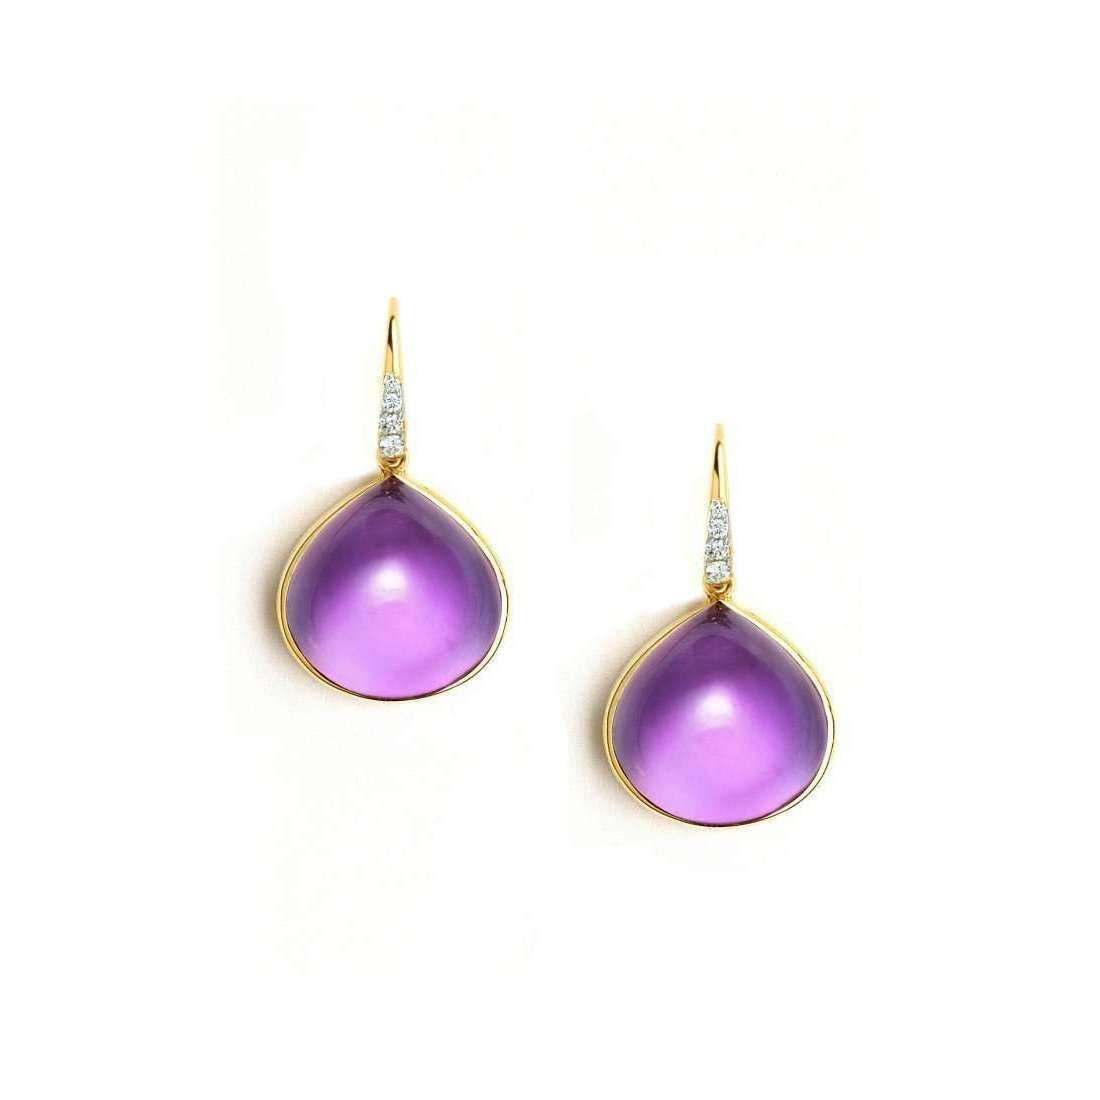 Syna 18kt Amethyst Earrings With Champagne Diamonds Fn2U09I